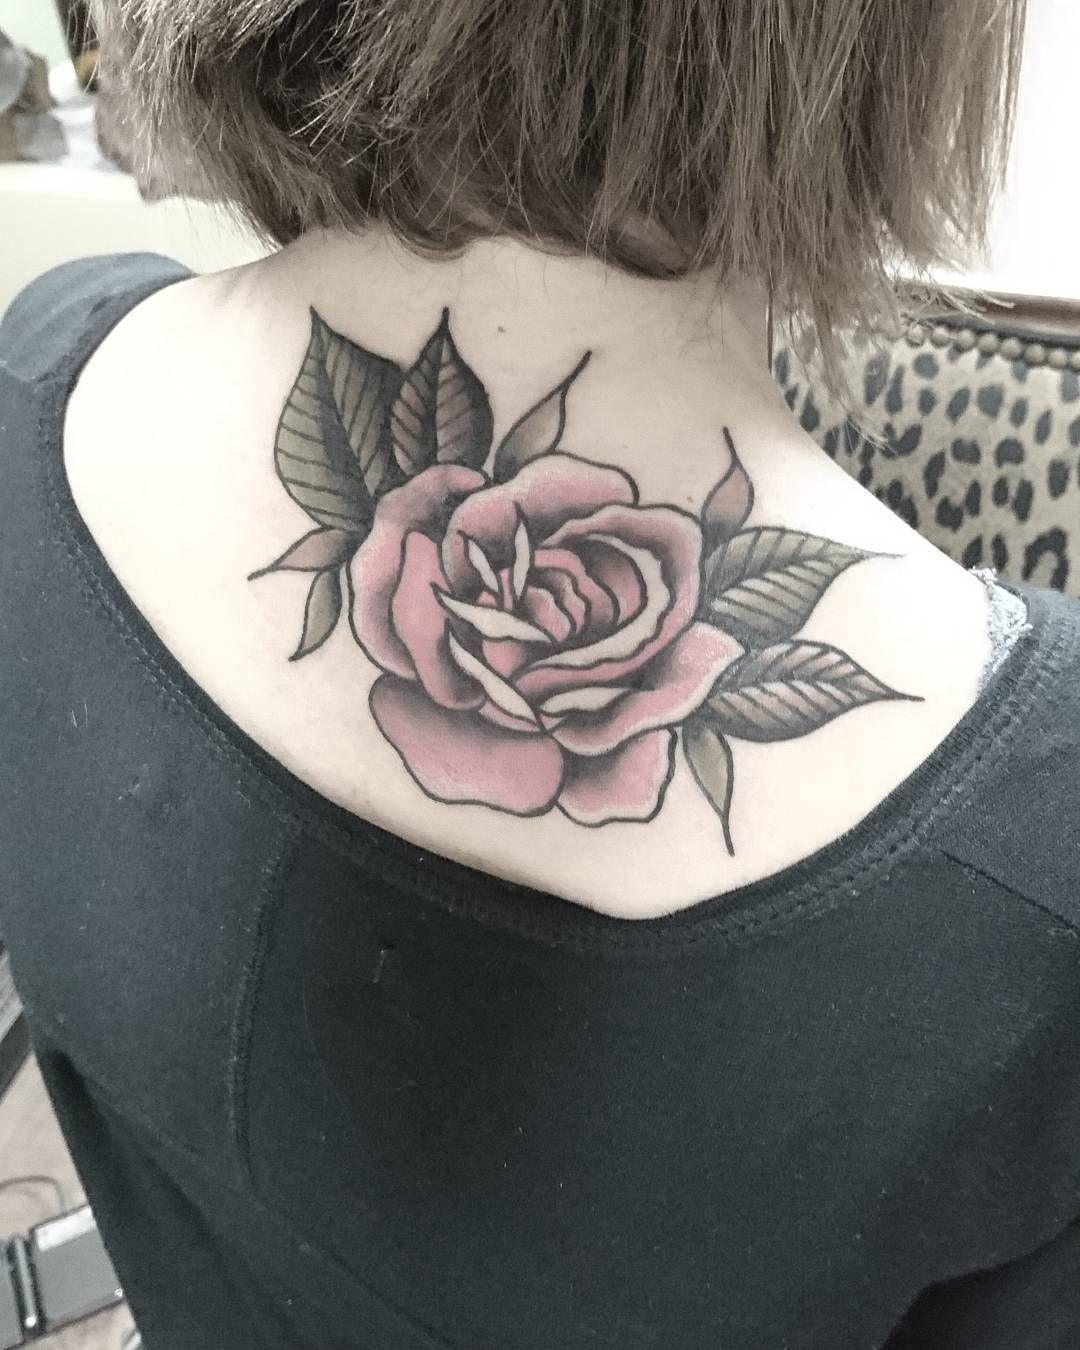 Rose Tattoo Neck Back Design Lava360 Tattoos Pinterest